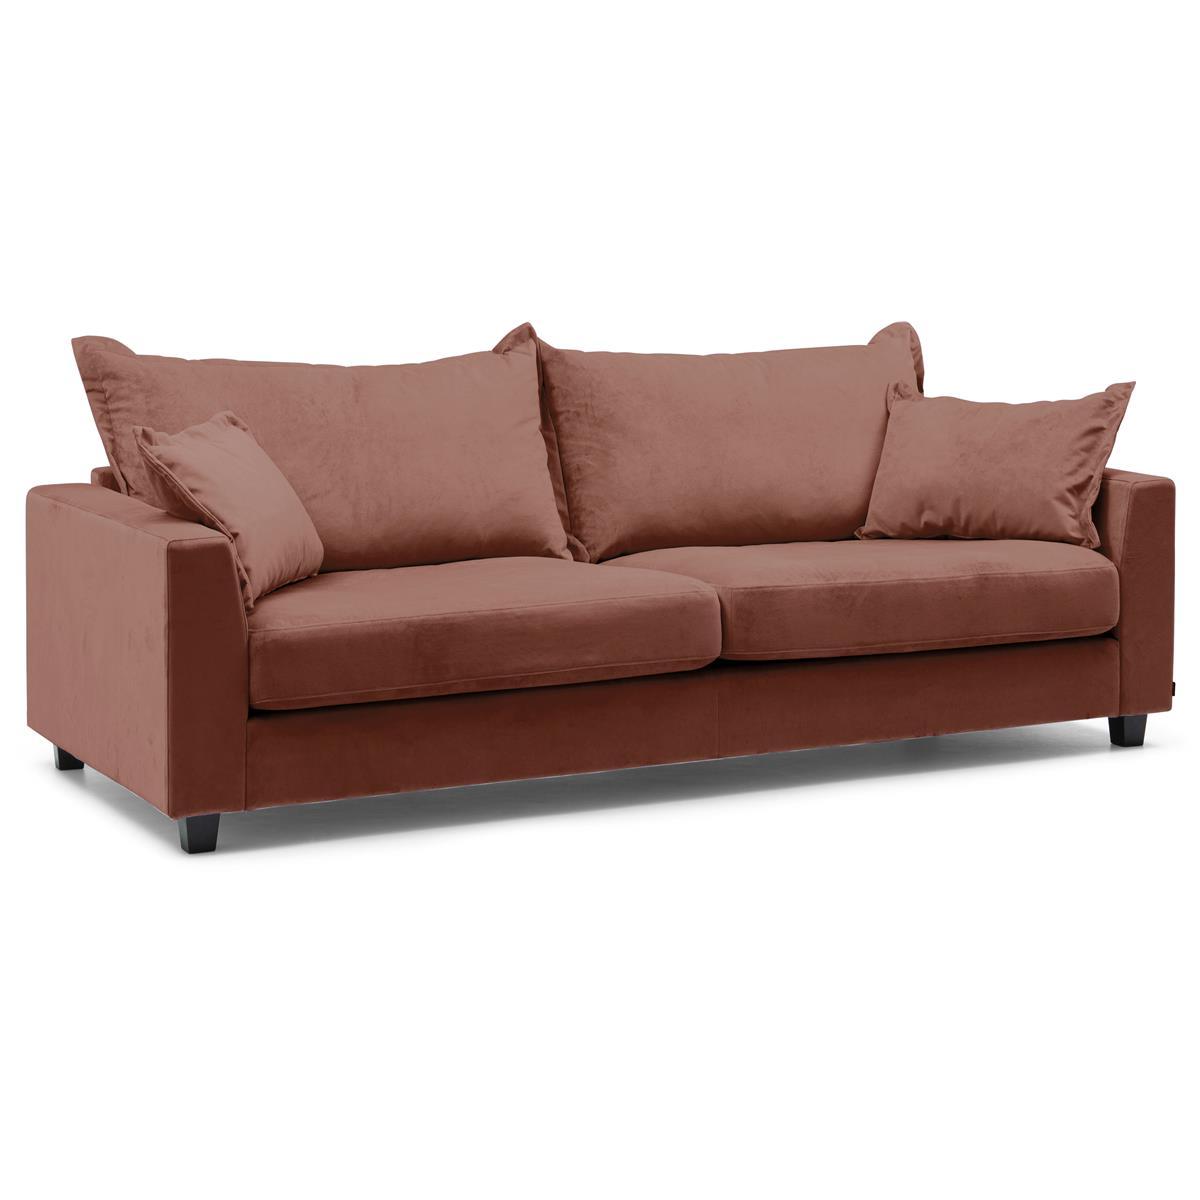 Louise-soffa-3-sits-meda-congac